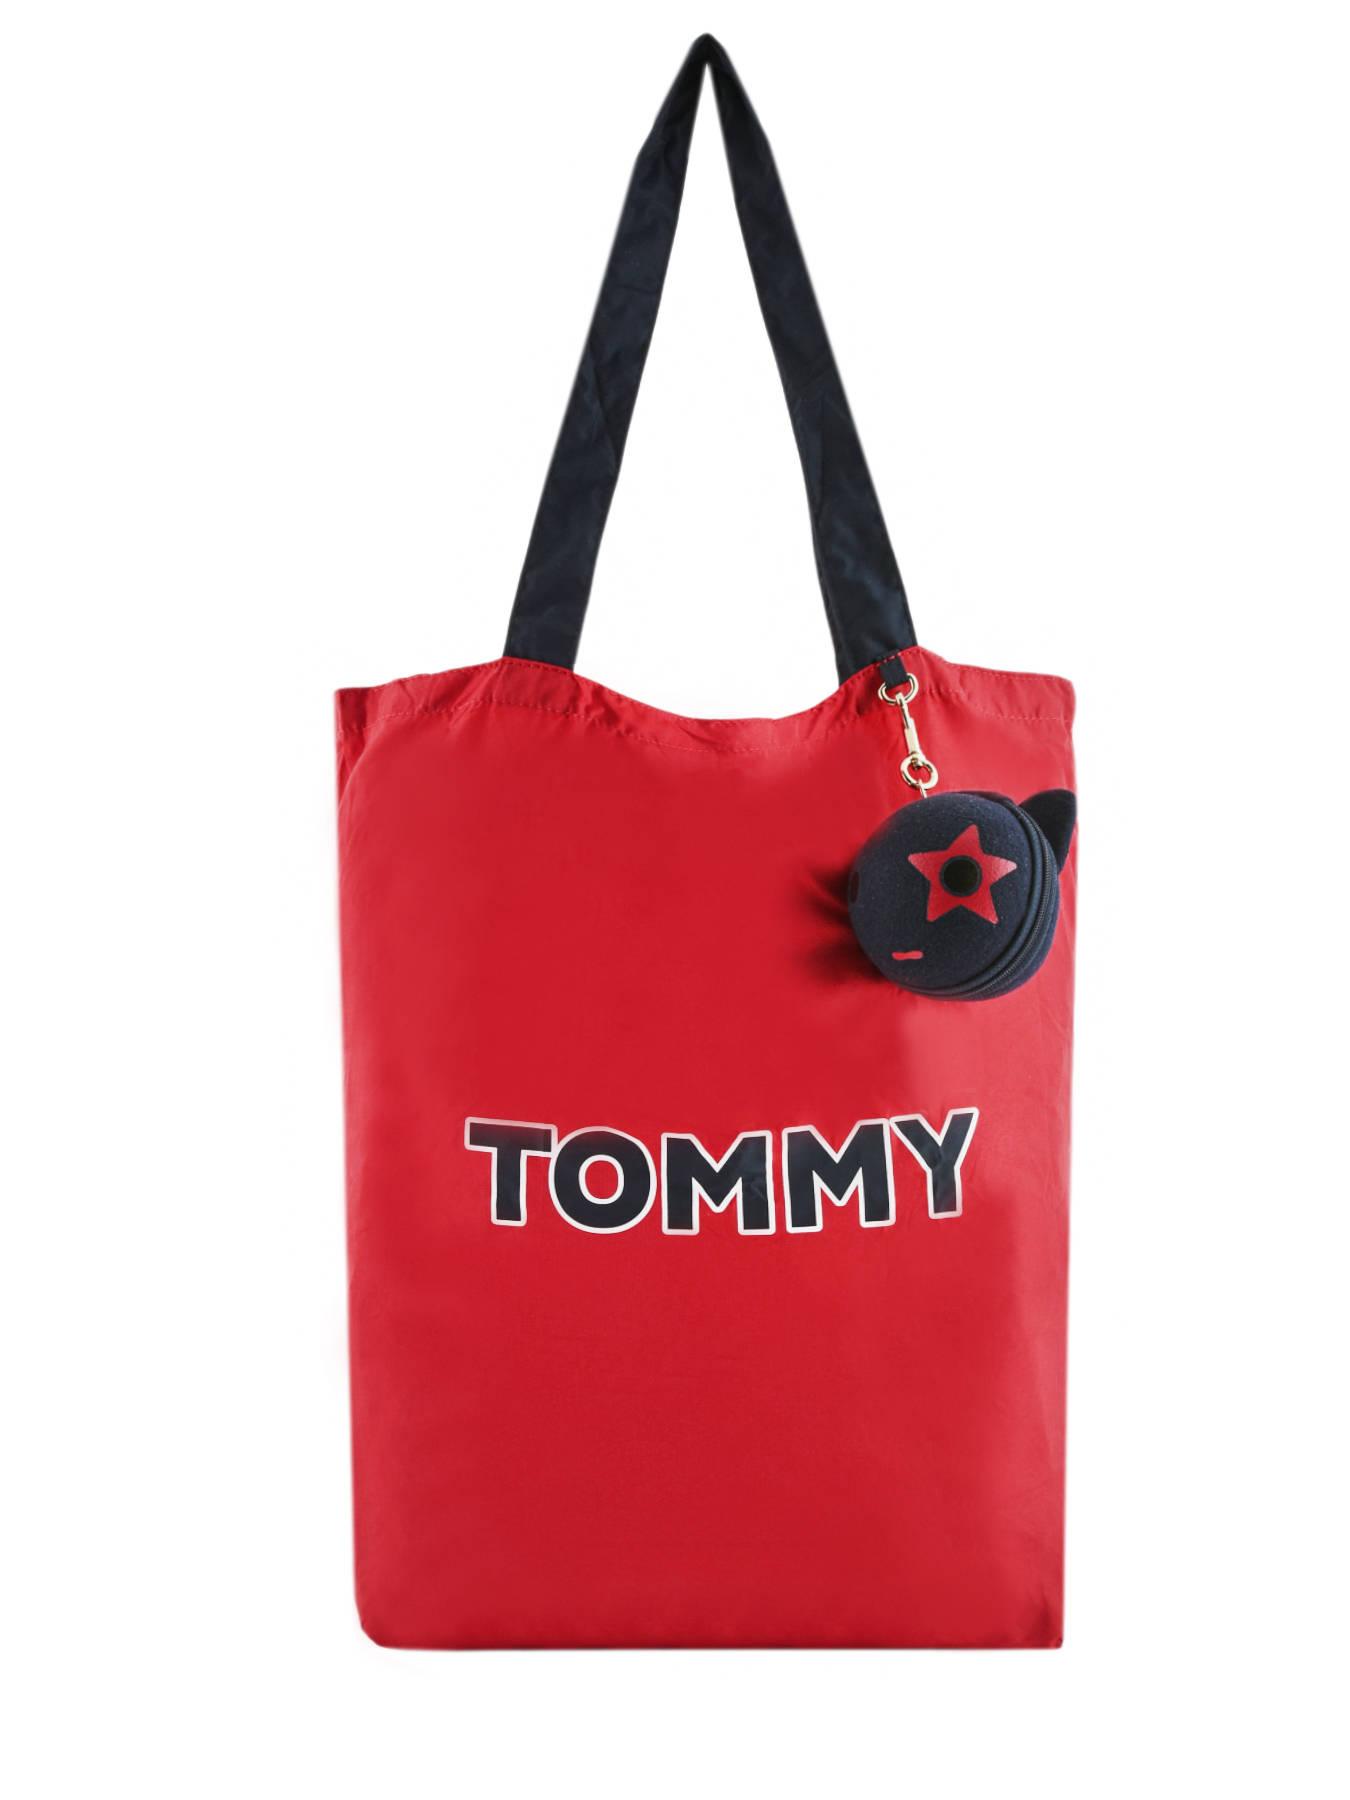 f0f2bbf17f8 ... Sac Porte Epaule Th Effortless Tommy hilfiger Multicolor th effortless  AW06623 ...